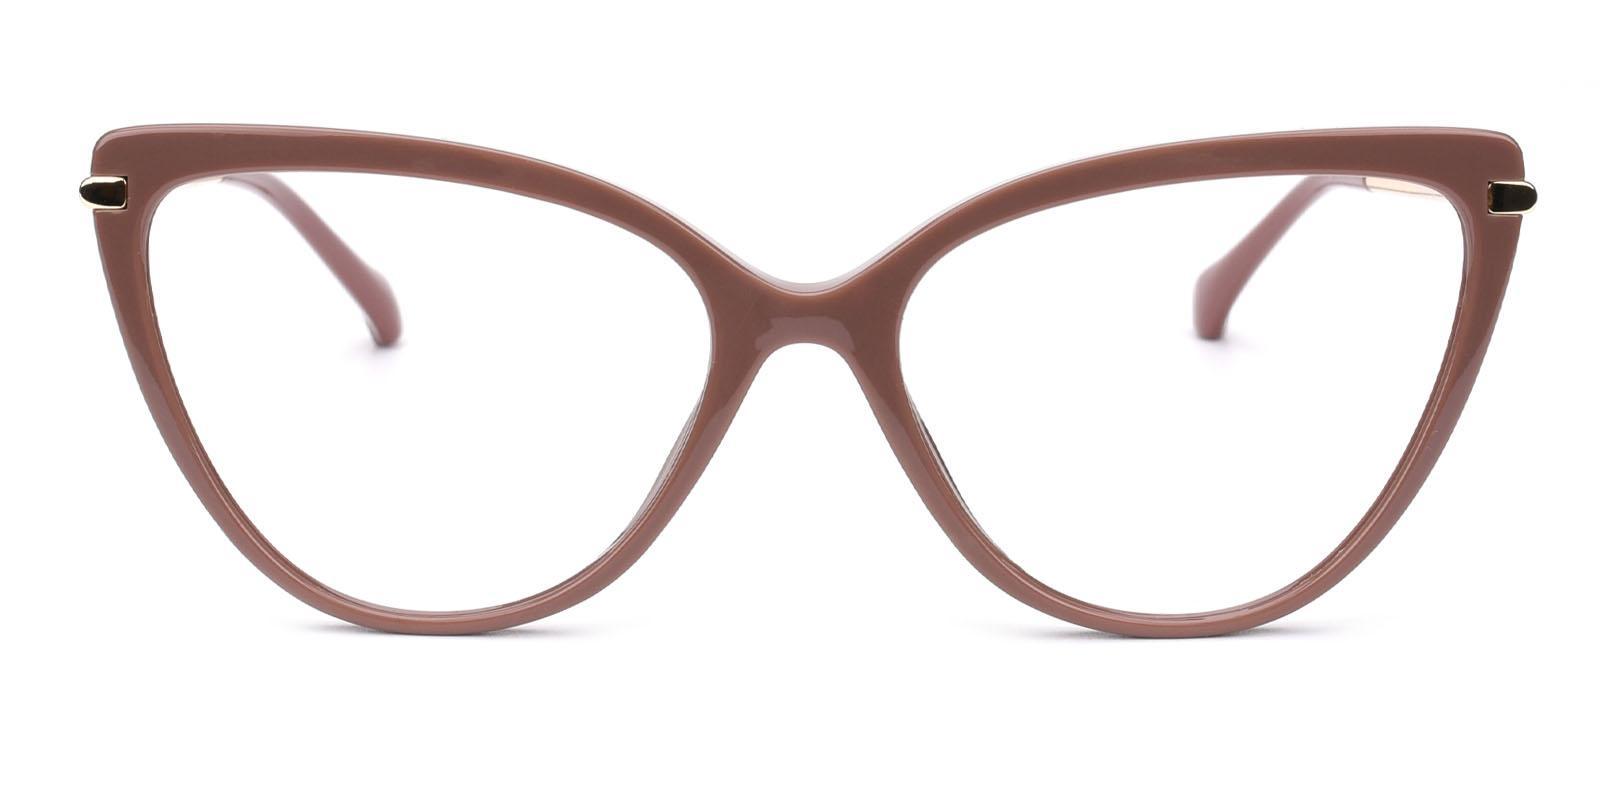 Doris-Pink-Cat-Combination-Eyeglasses-additional2